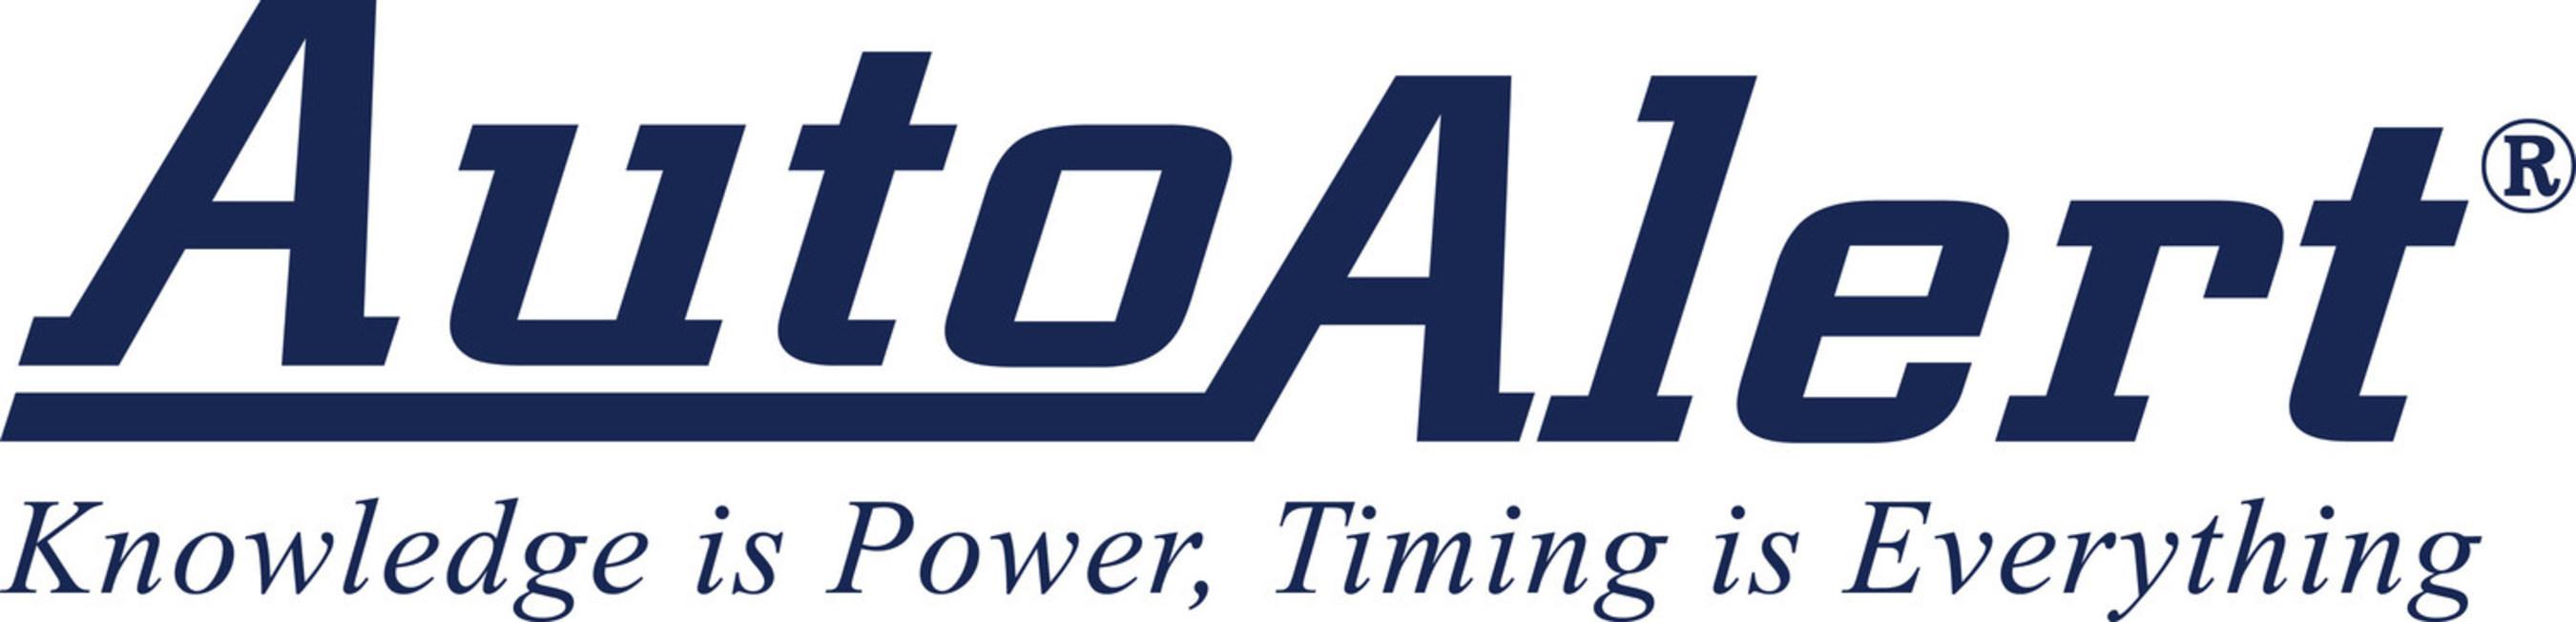 AutoAlert, Inc. Logo.  (PRNewsFoto/AutoAlert, Inc.) (PRNewsfoto/AutoAlert, Inc.)